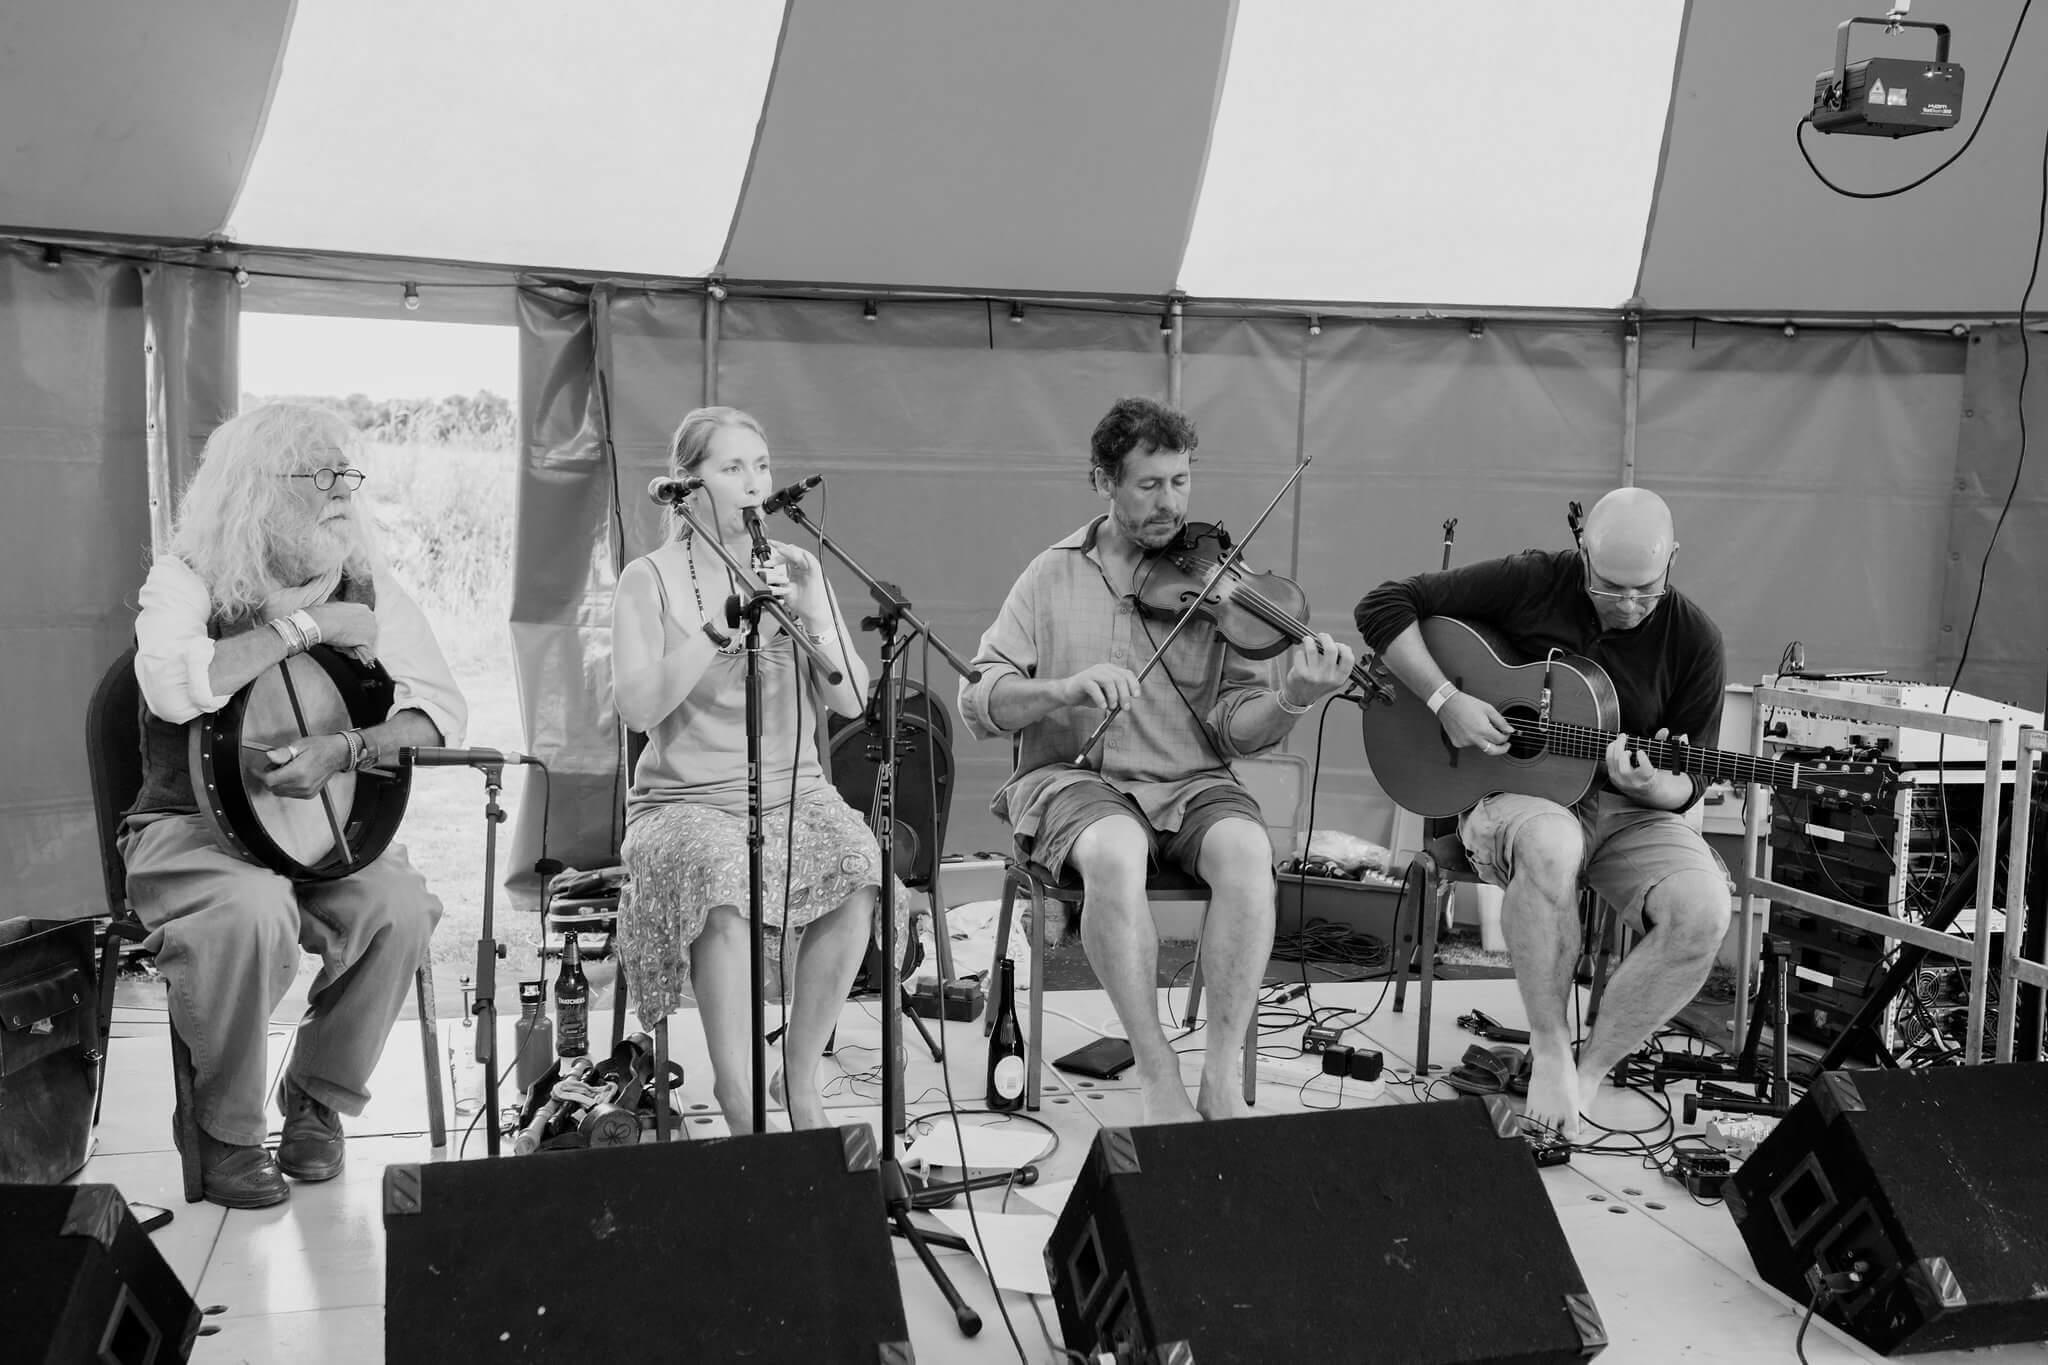 Cornish wedding band playing in alternative wedding marquee